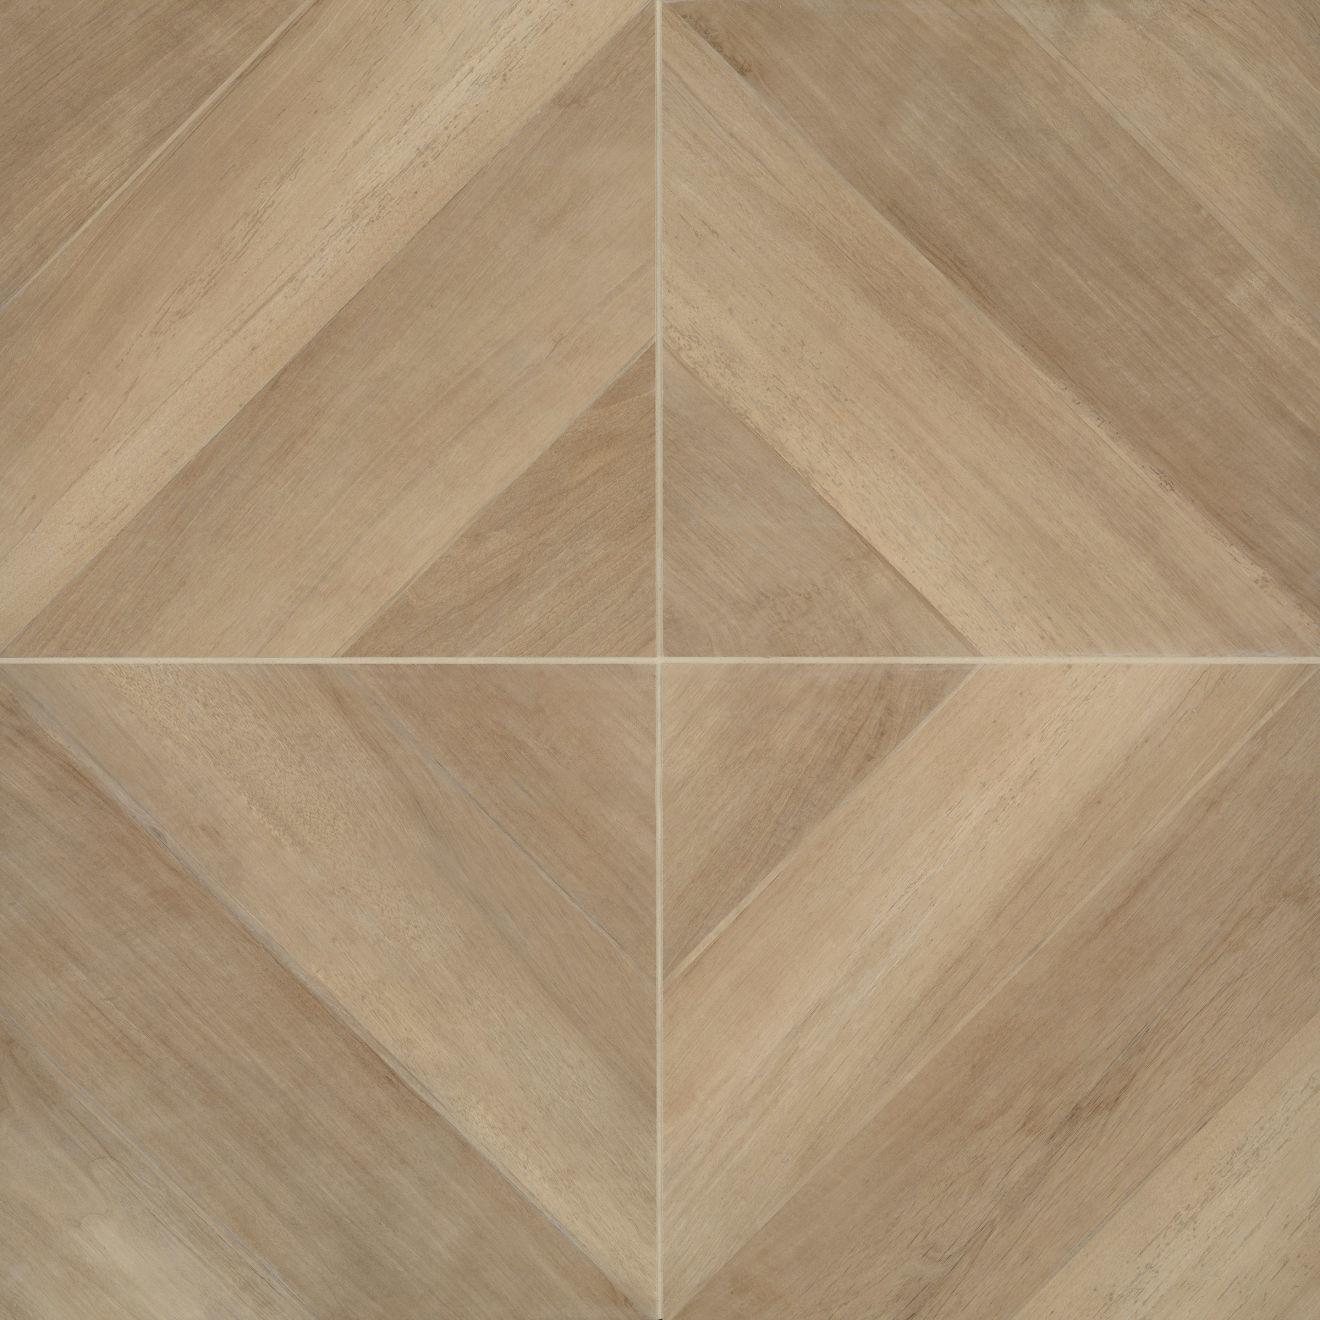 "Antique 24"" x 24"" Floor & Wall Tile in Clay"